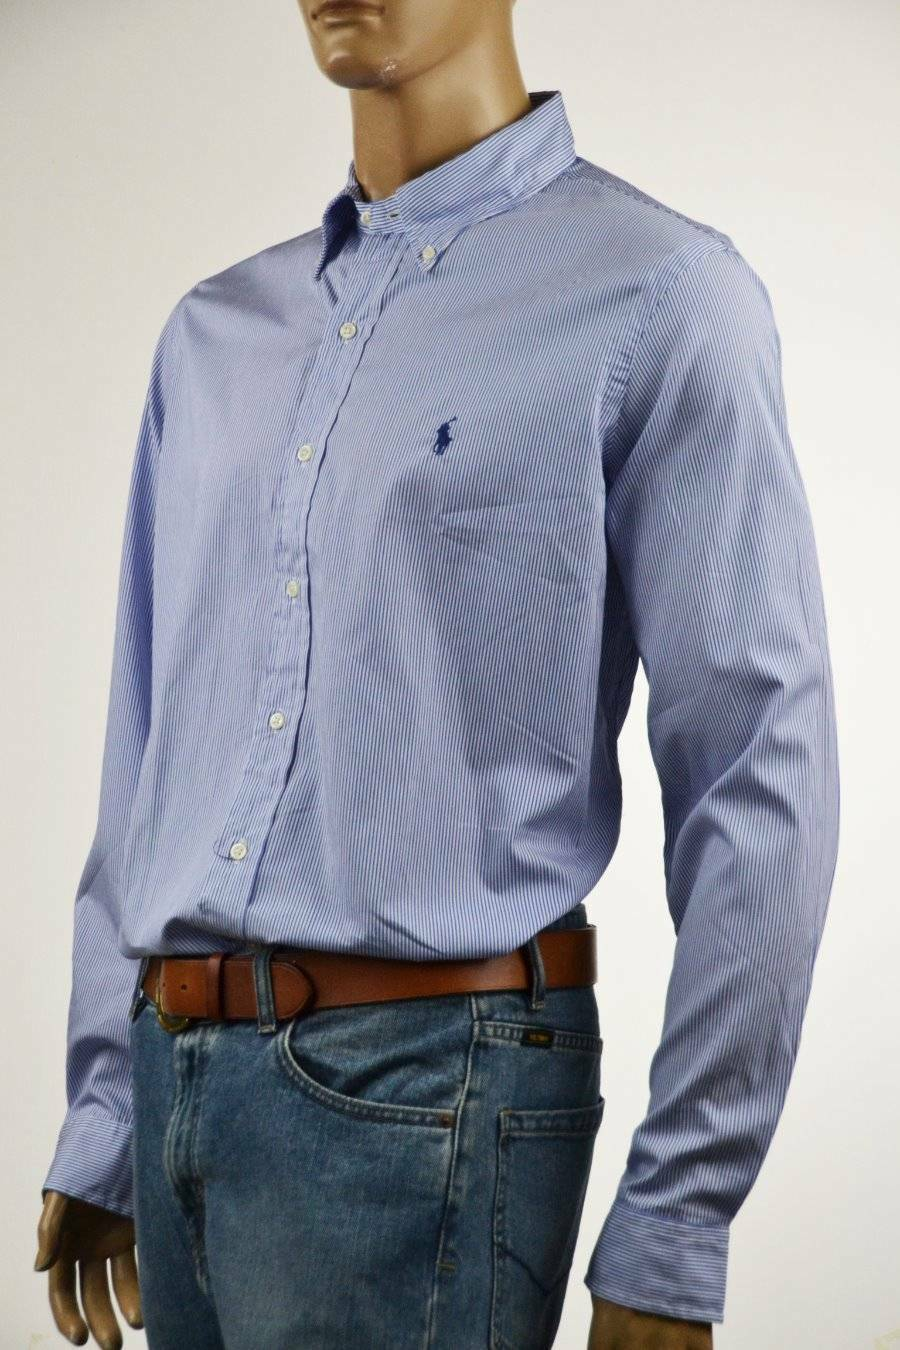 Ralph Lauren bluee Stripe Cotton Long Sleeve Shirt -bluee Pony-NWT-XLarge